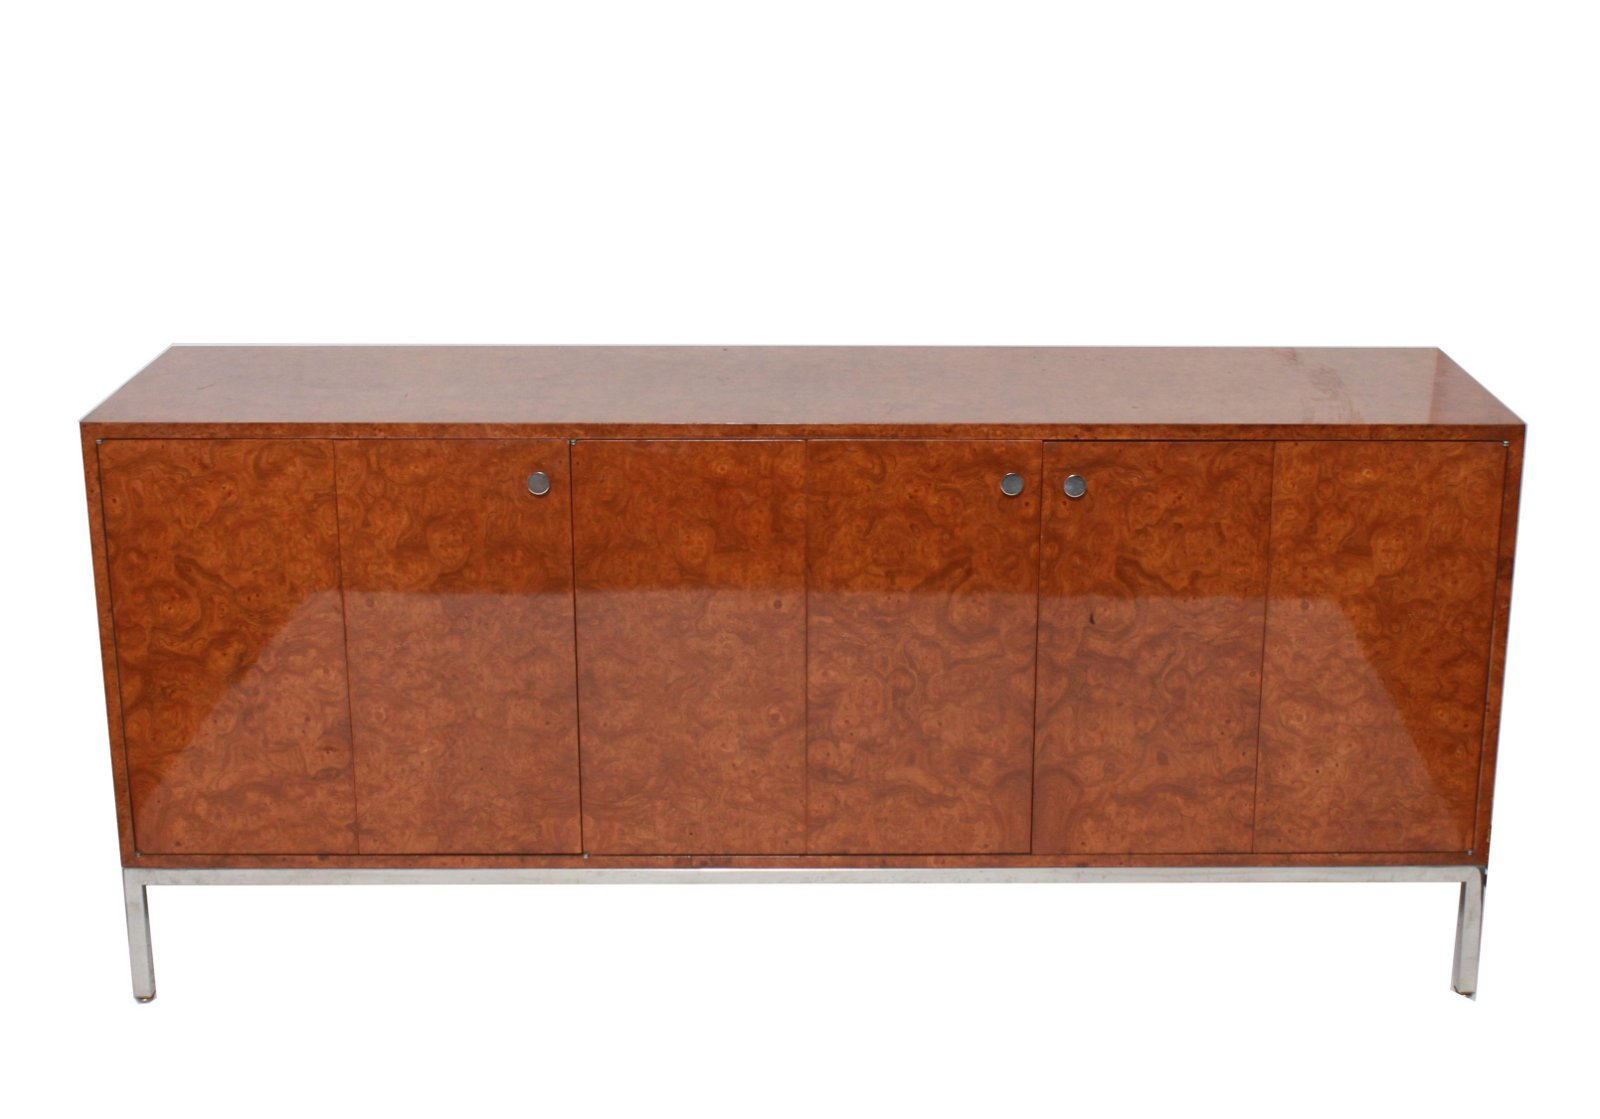 Pace Mid-Century Modern Burlwood Sideboard